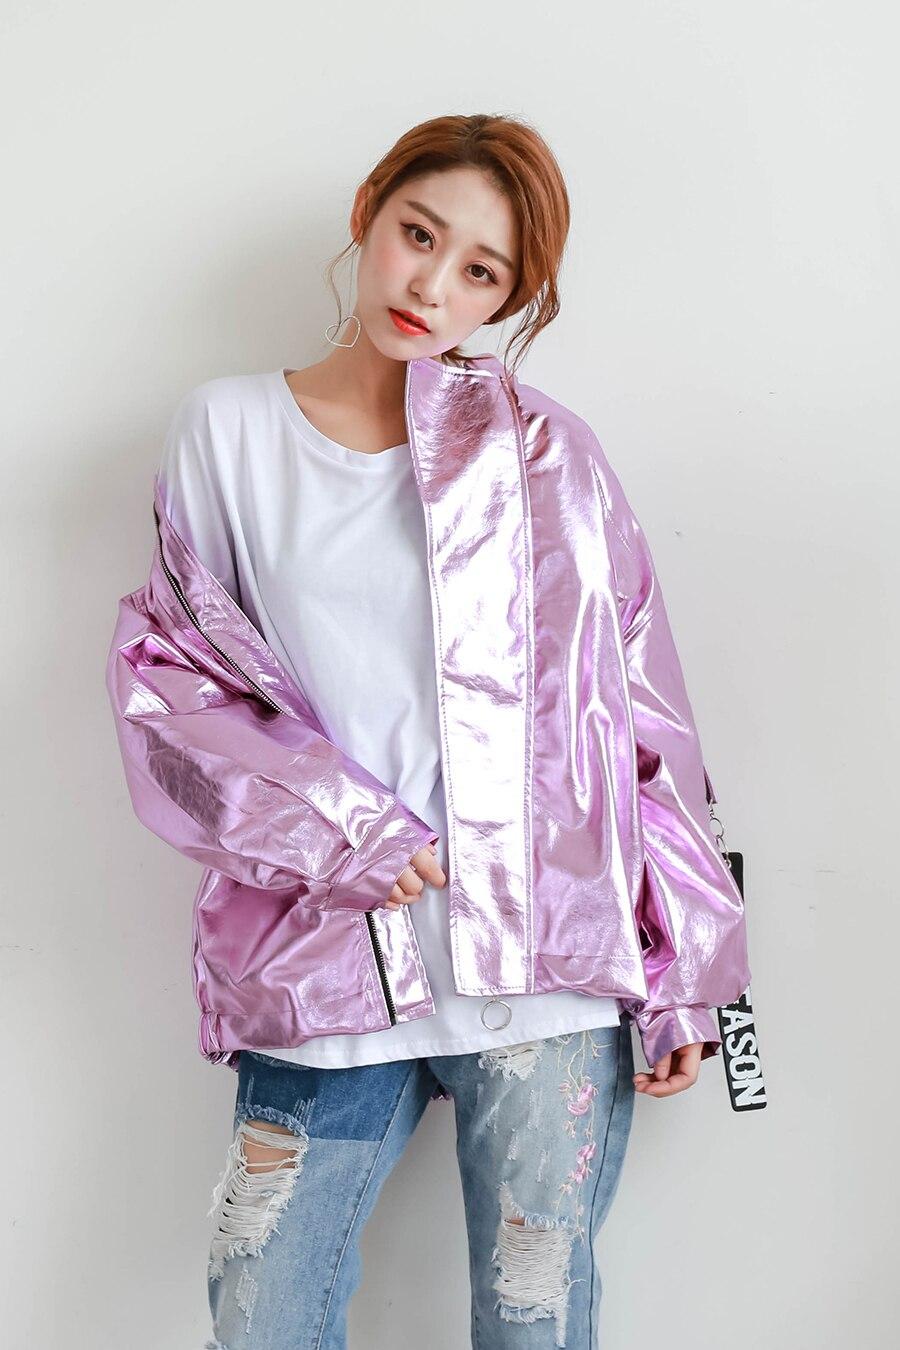 2017-Autumn-New-Metal-Barbie-Pink-Silver-Hologram-Punk-Hip-Hop-Loosen-Jacket-Casual-Women-Men (6)